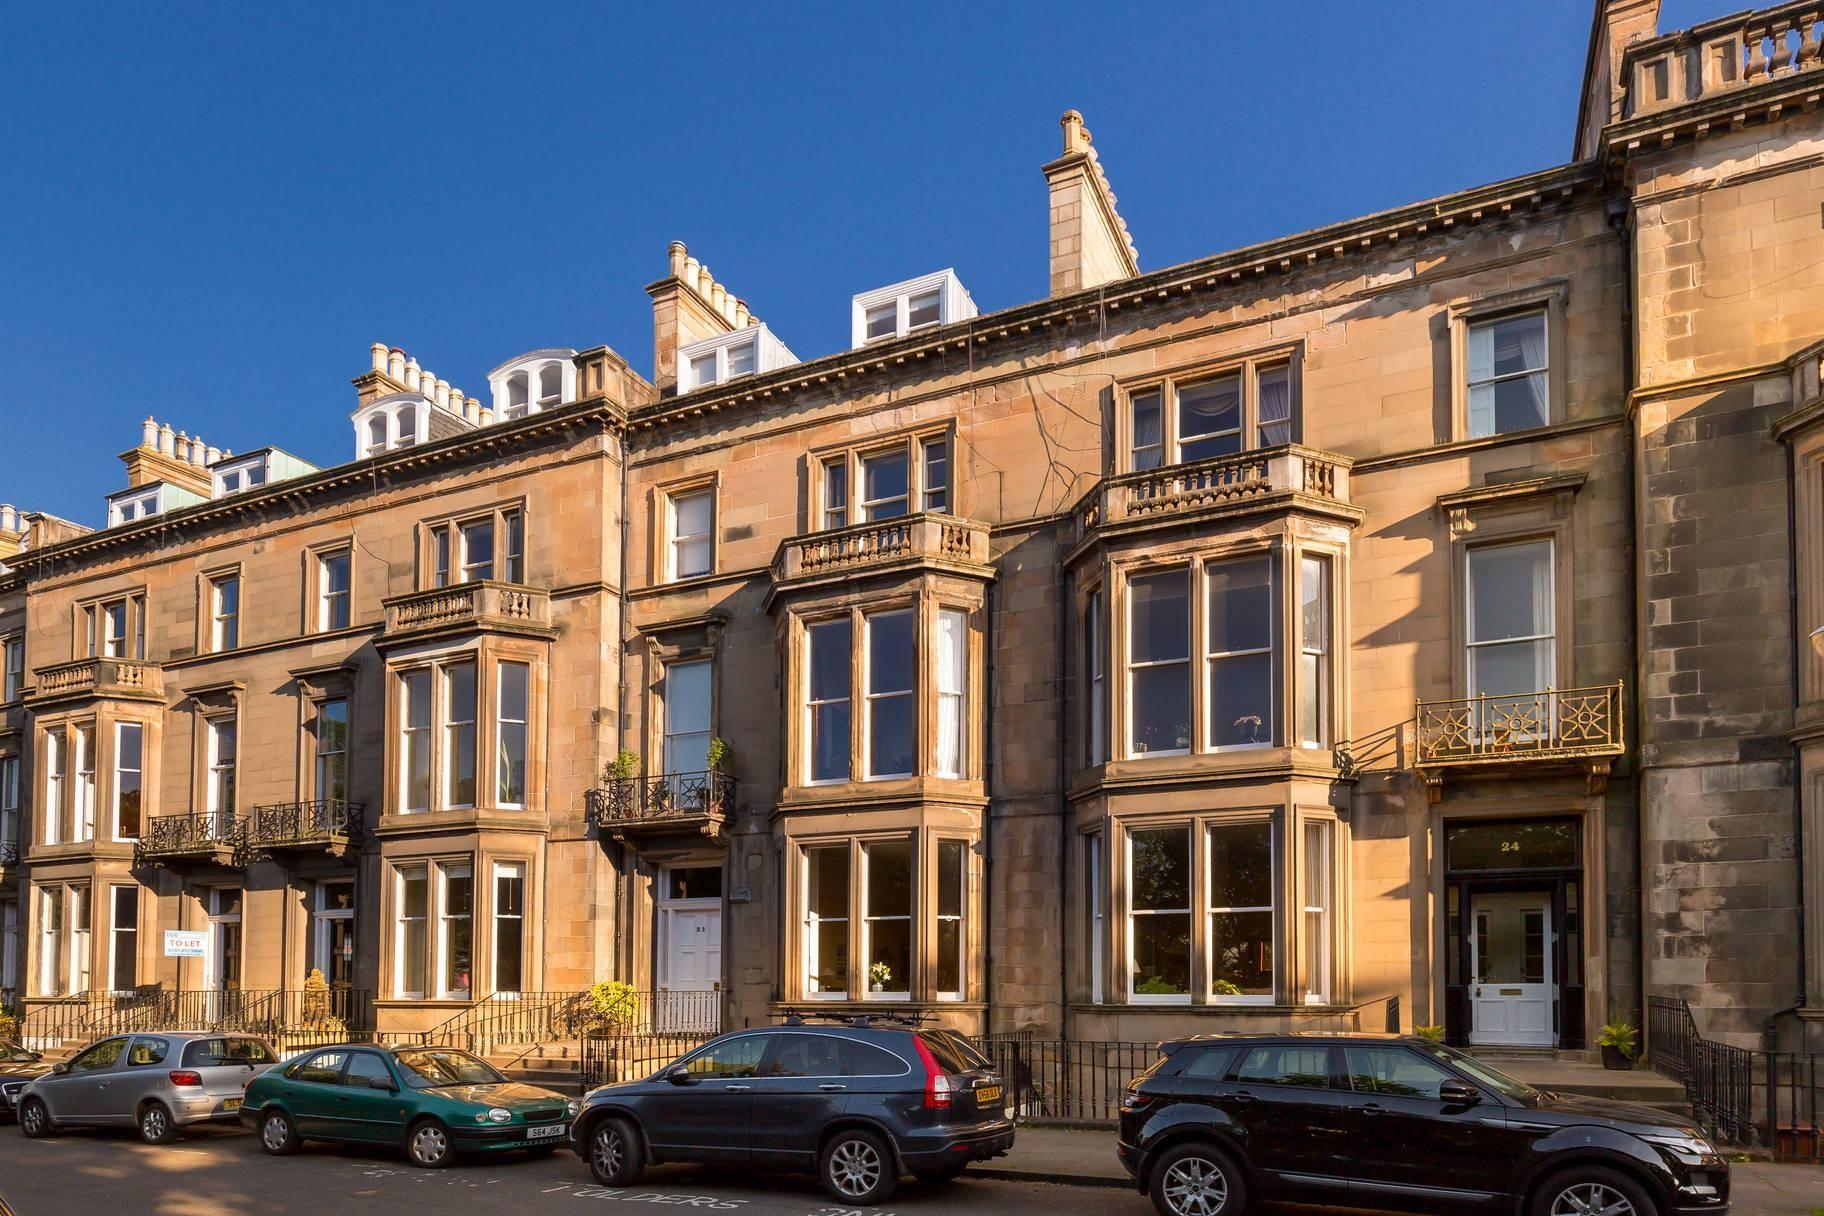 23/1 Buckingham Terrace, West End - Photo 1